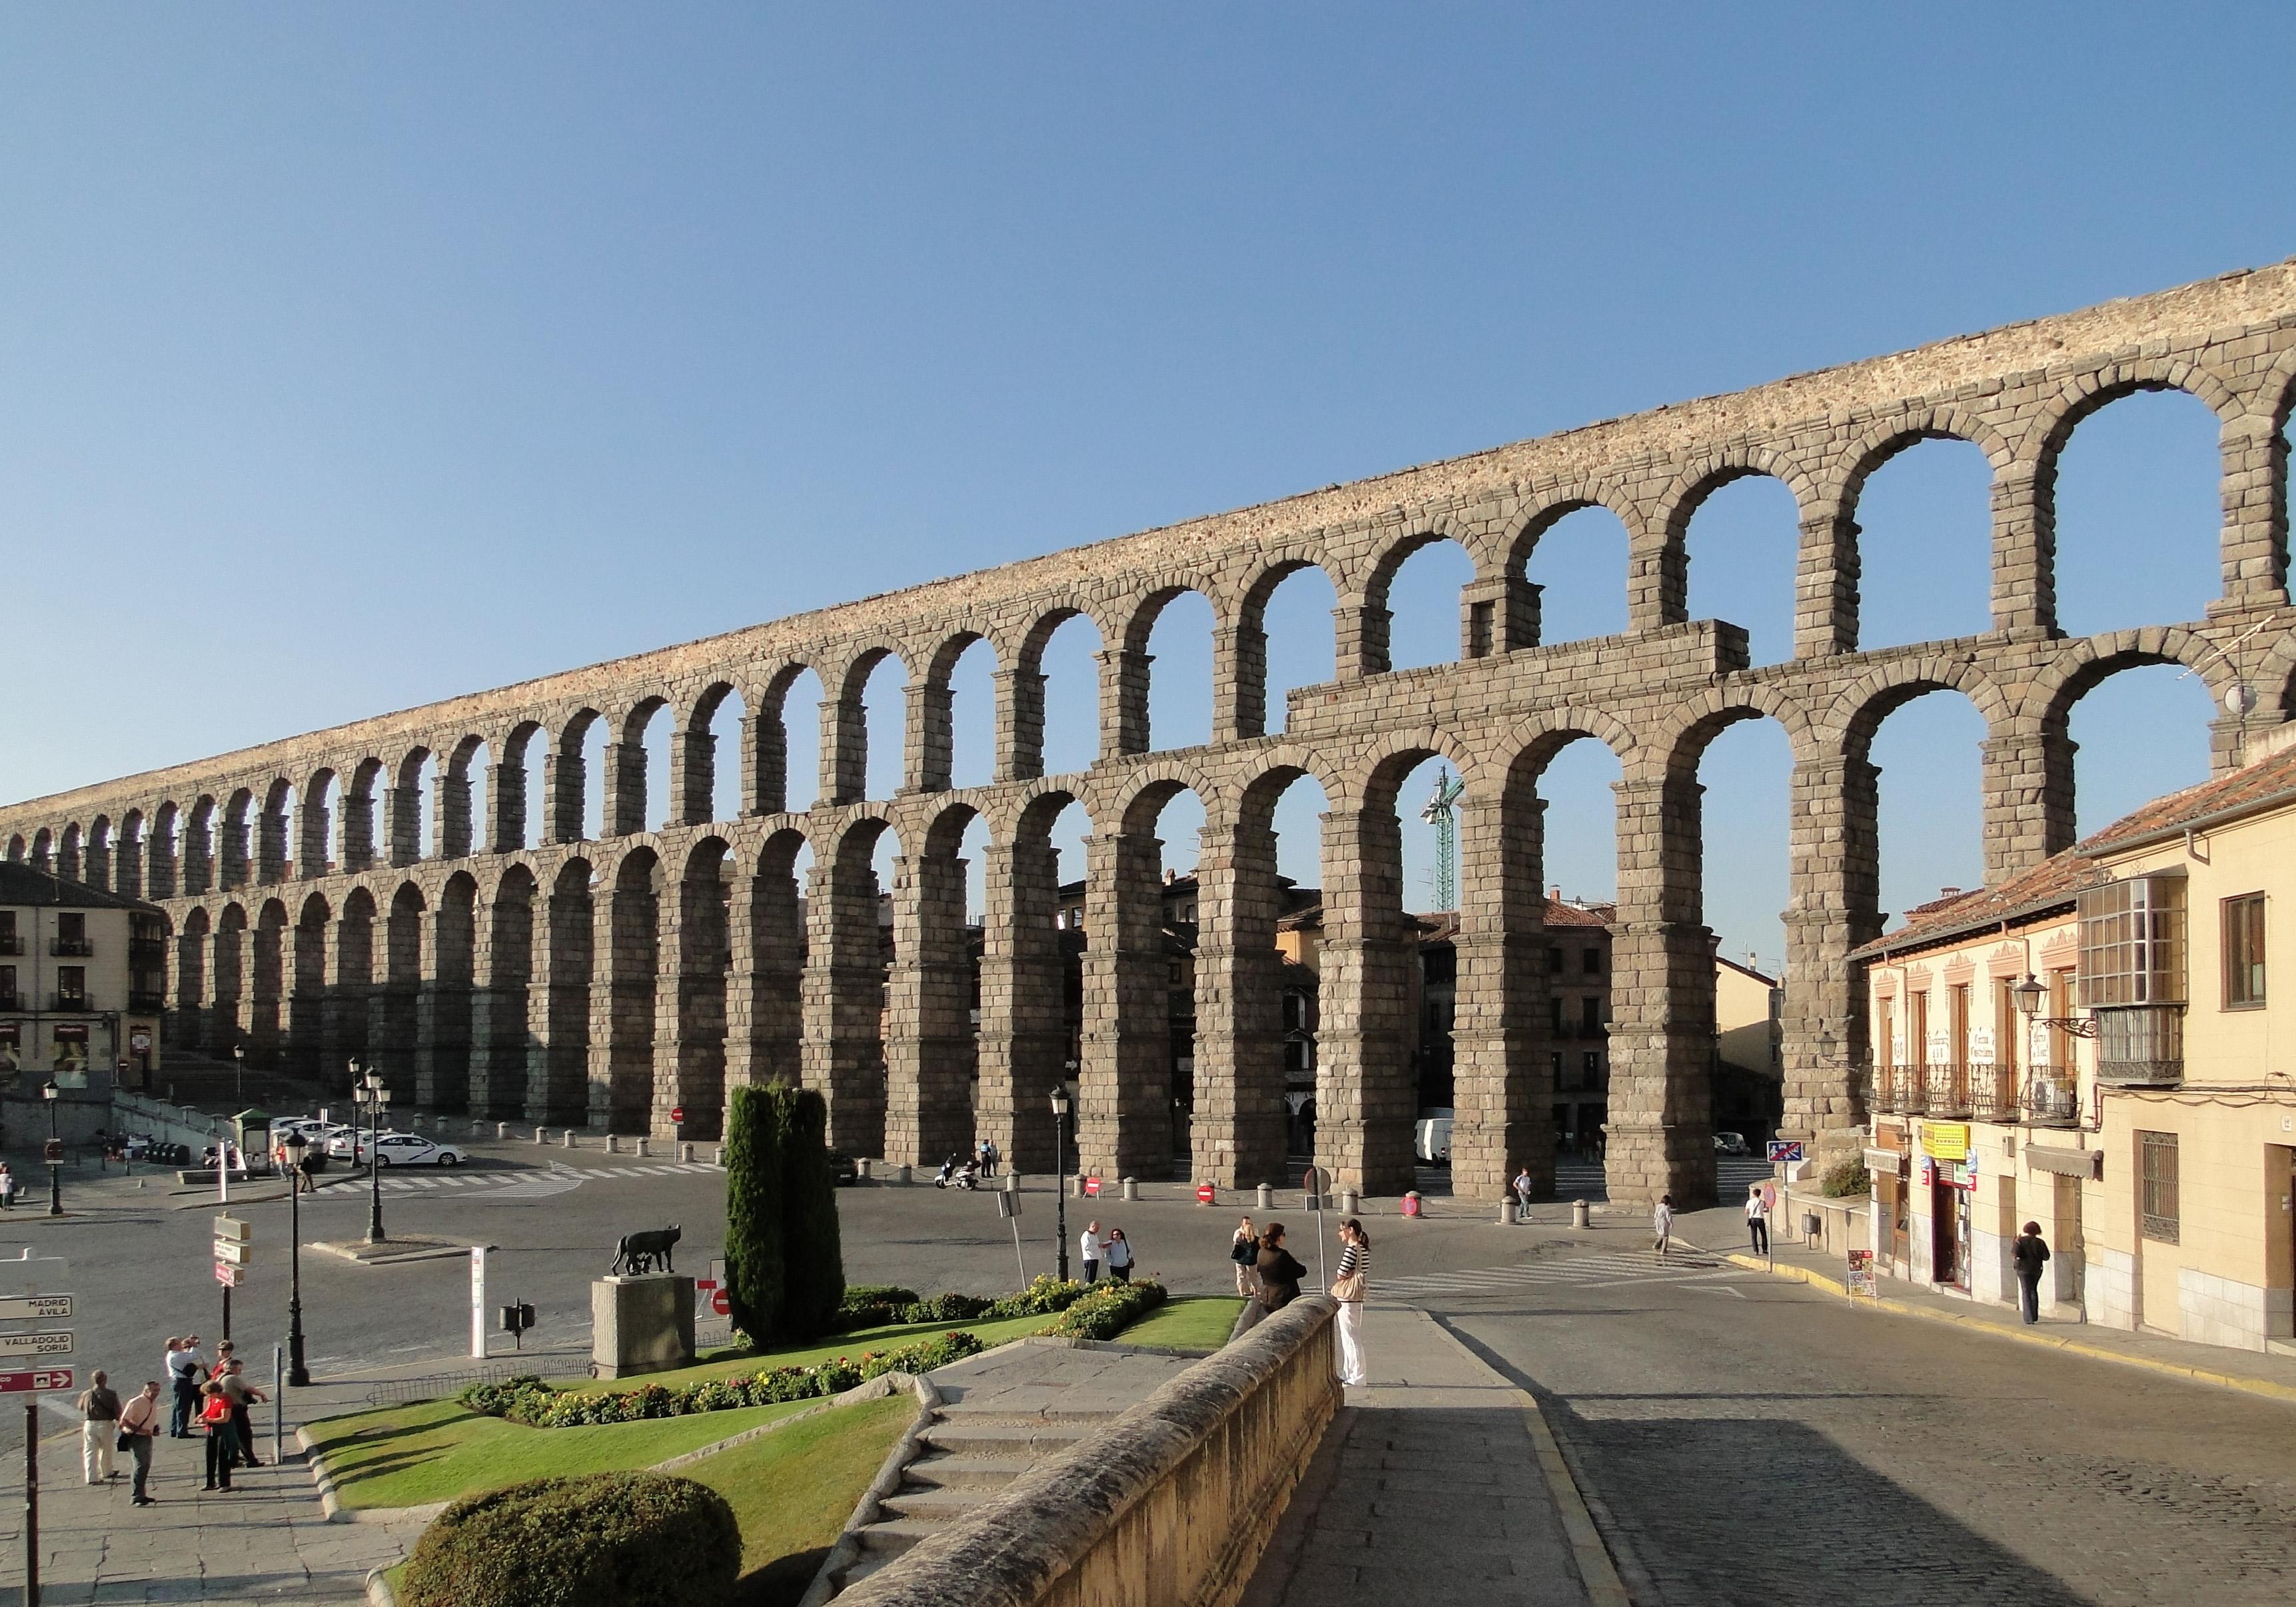 File:Aqueduct of Segovia 02.jpg